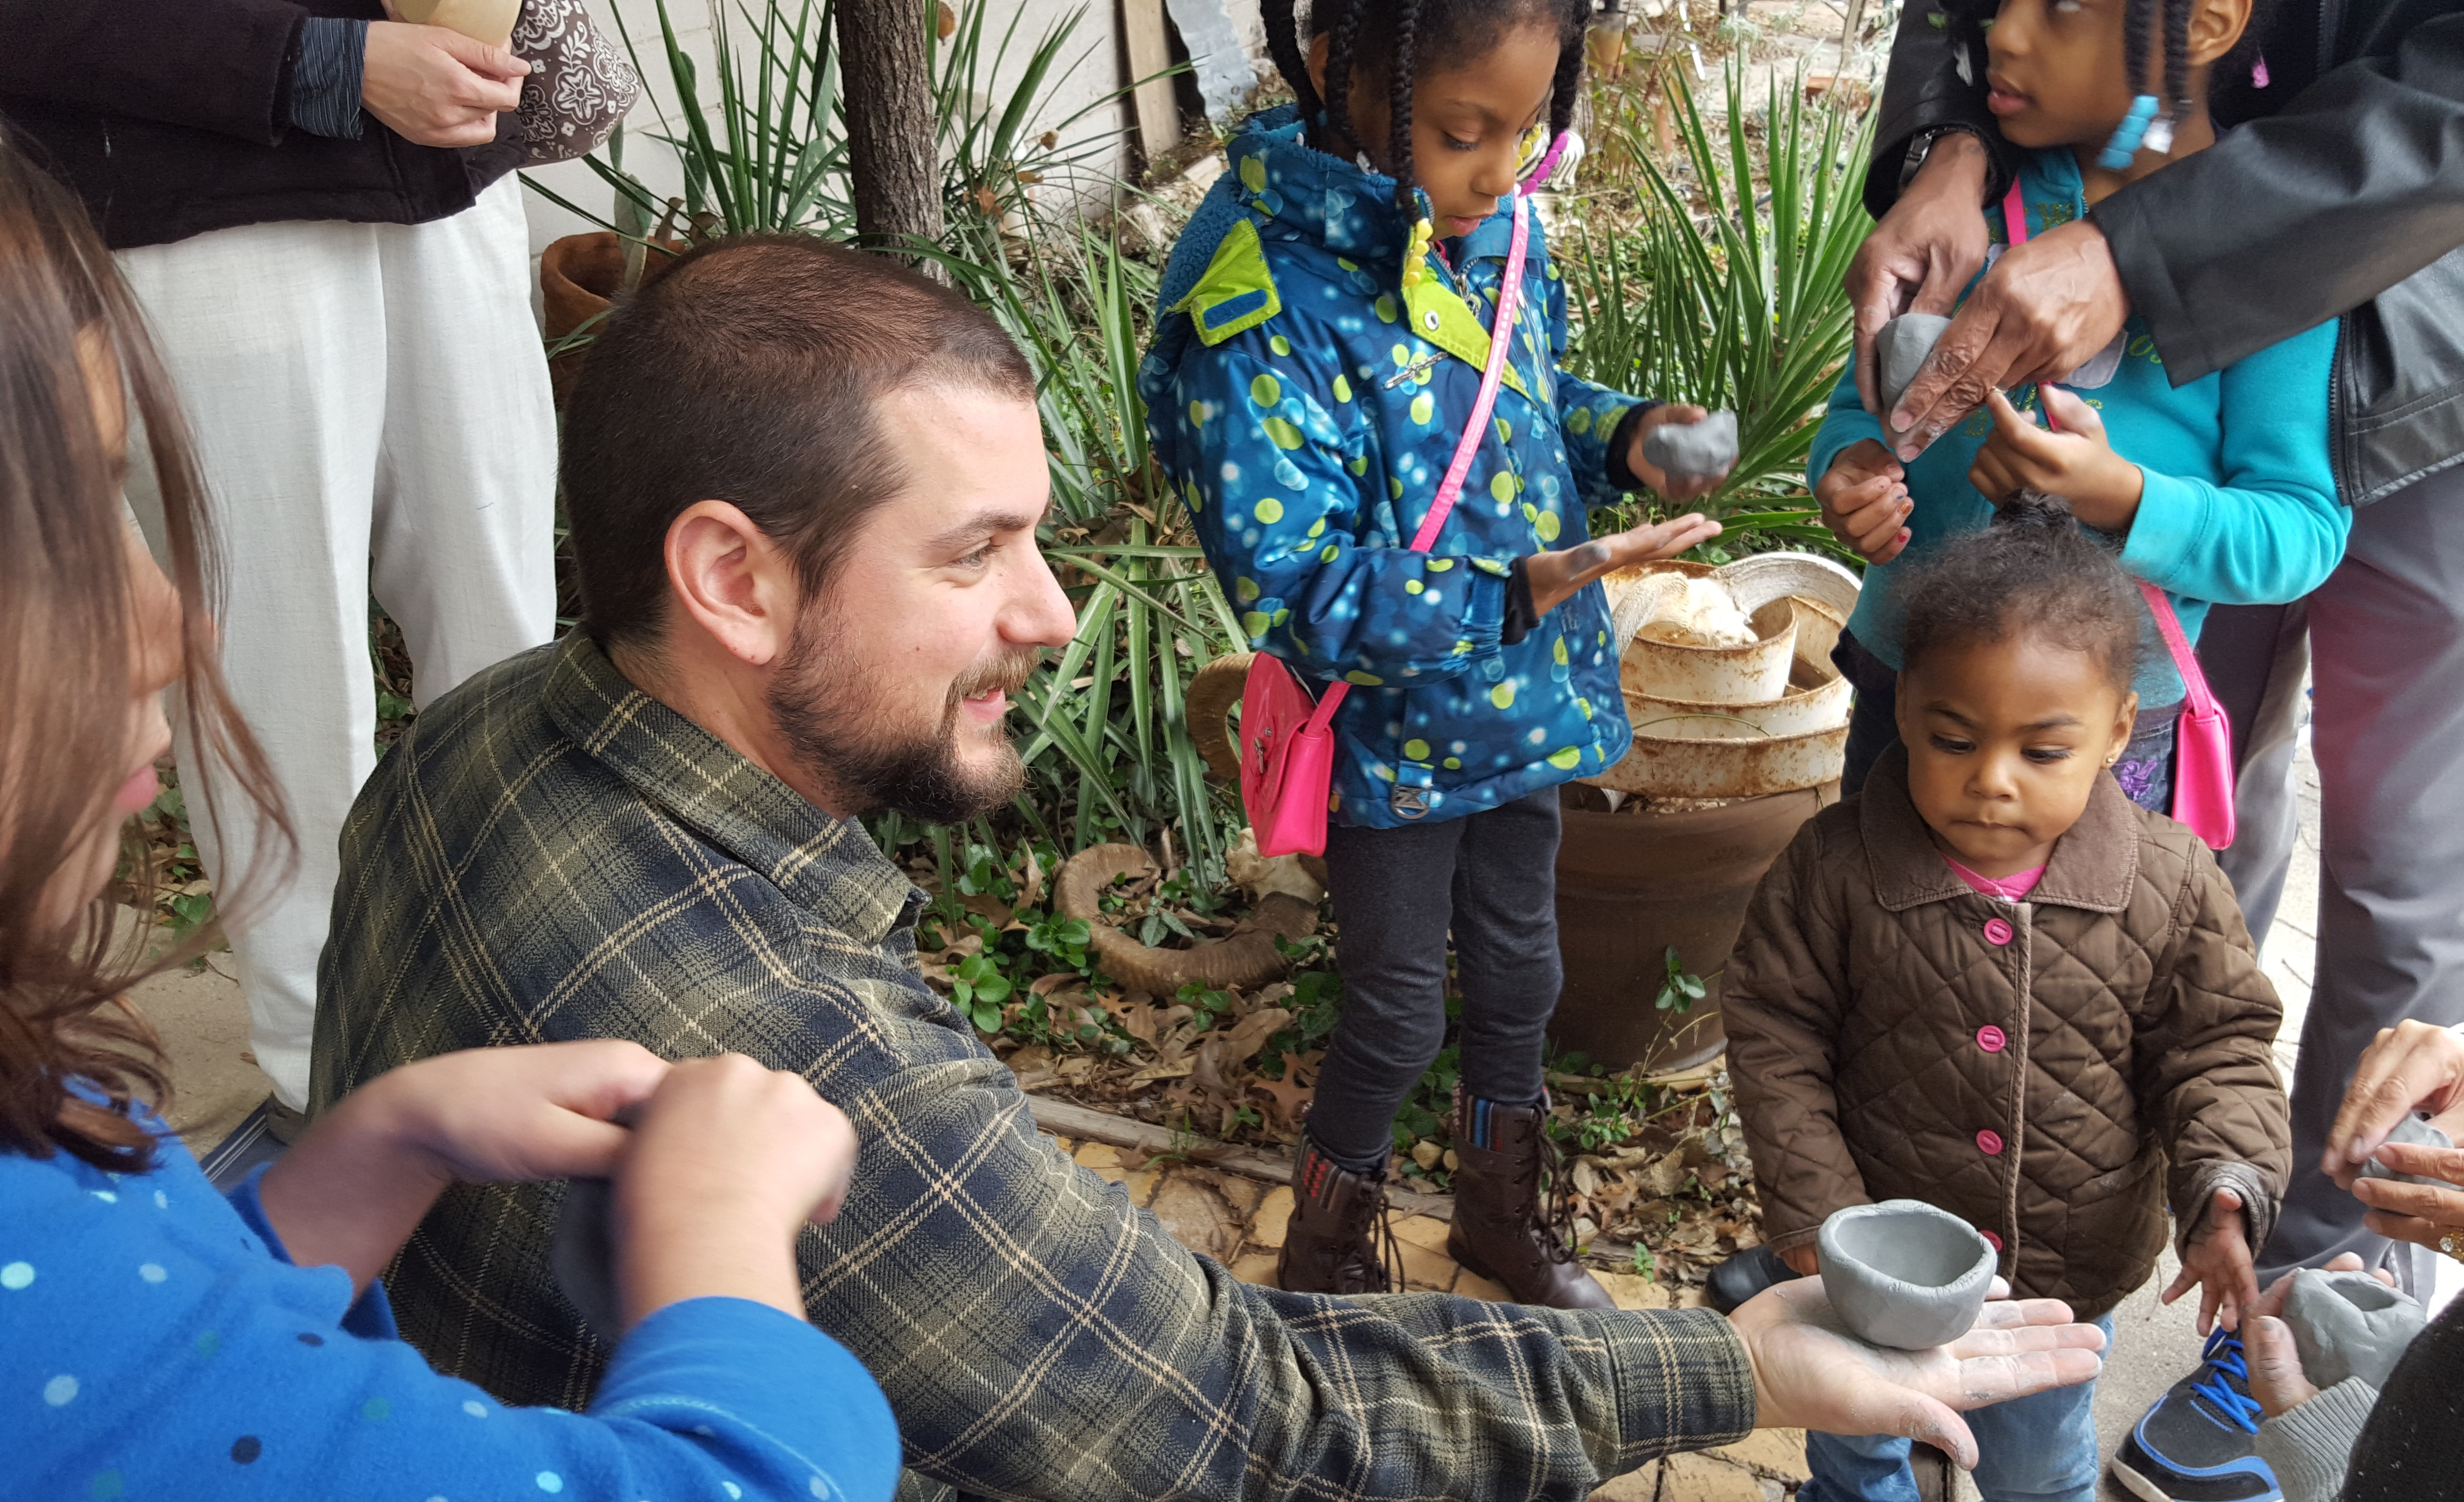 Eric Grasham showing the kids how to make a pinch pot